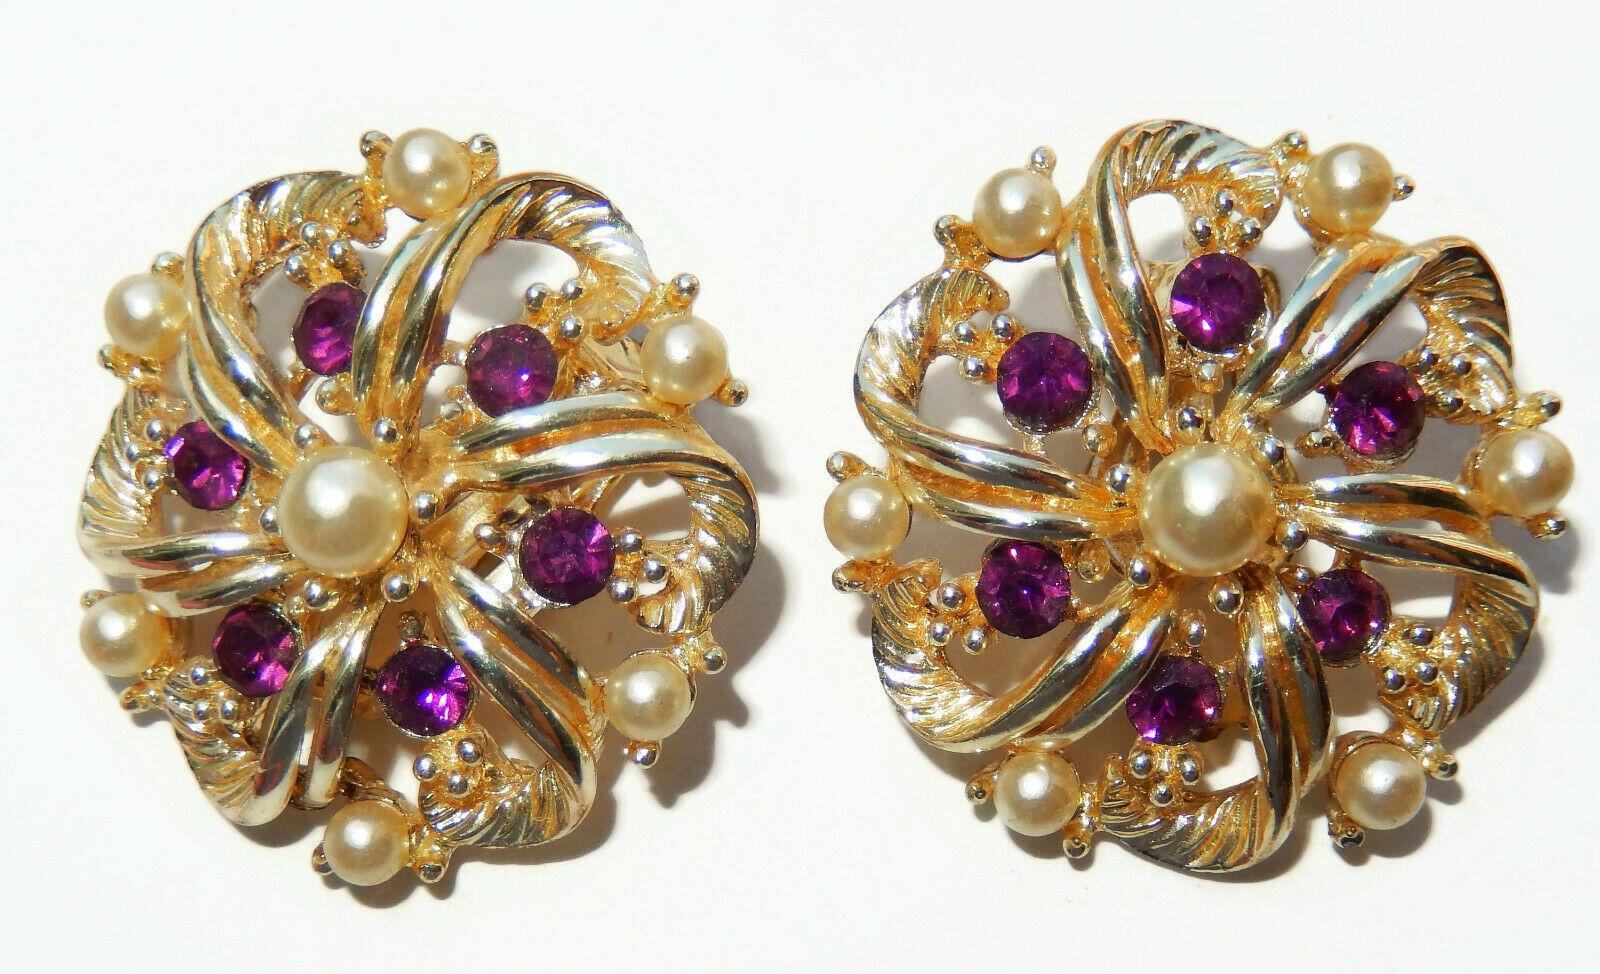 Vintage purple rhinestone faux pearl clip on earrings signed Star - $10.99